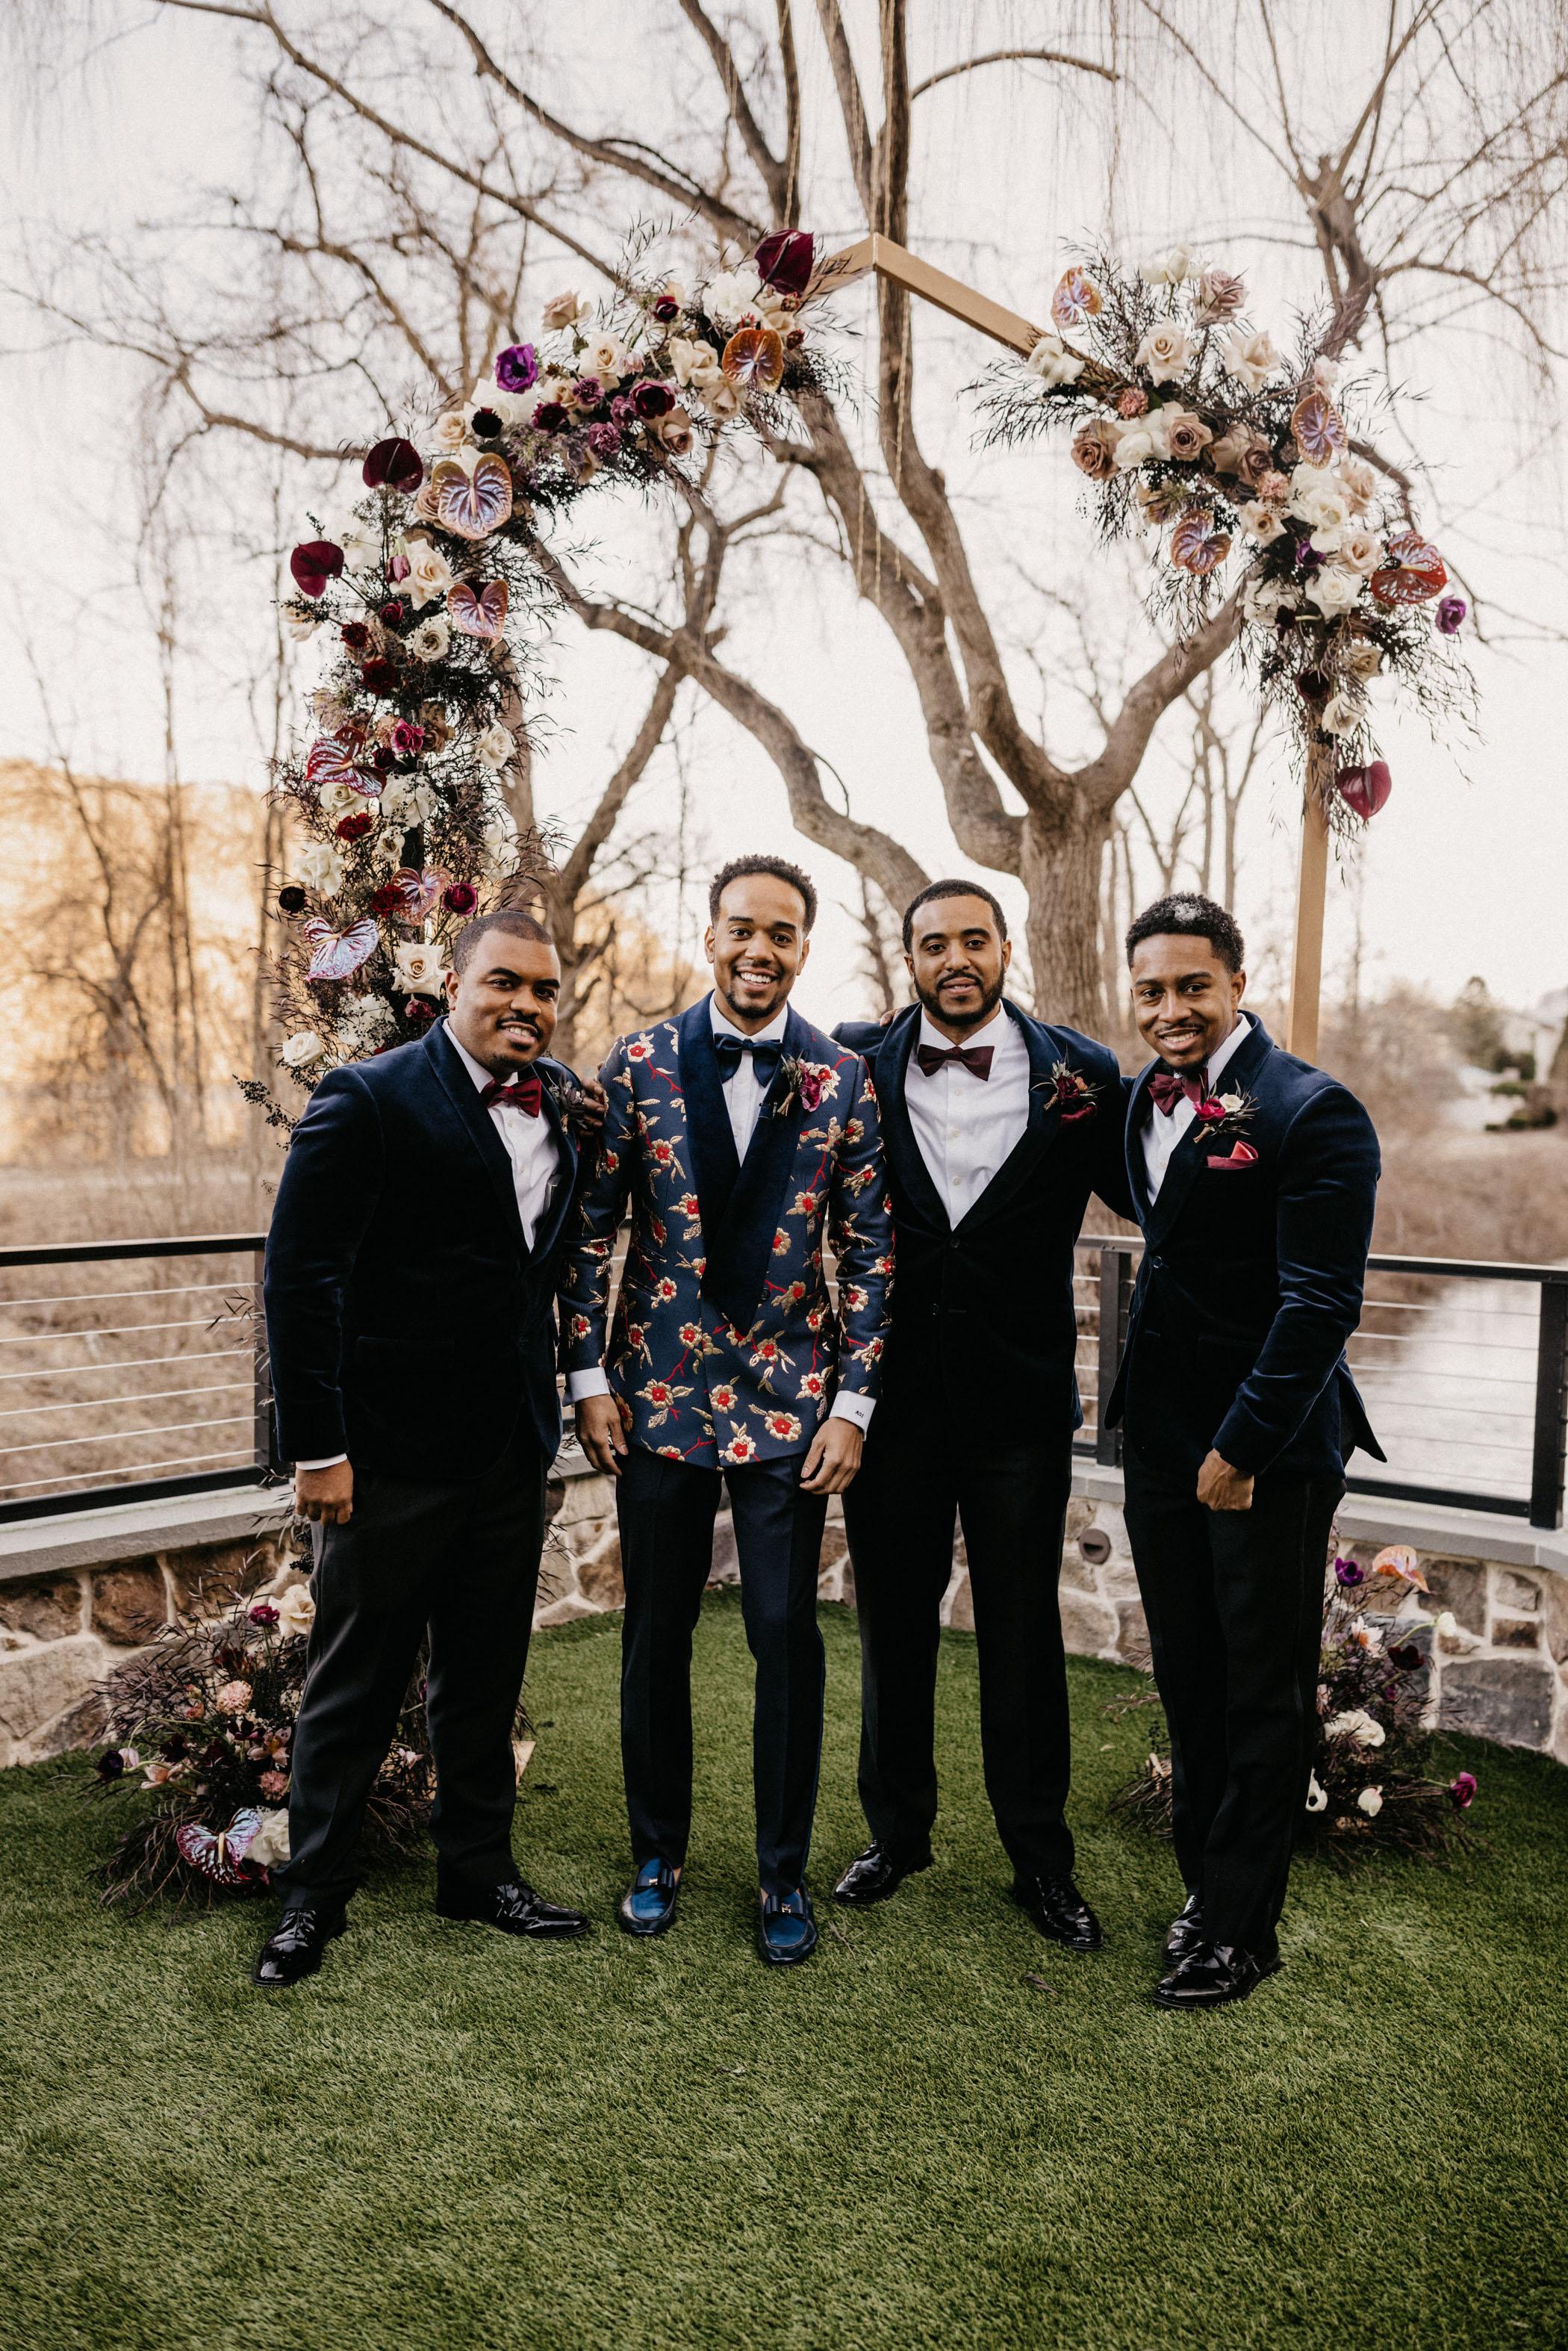 Velvet Suit Wedding Party